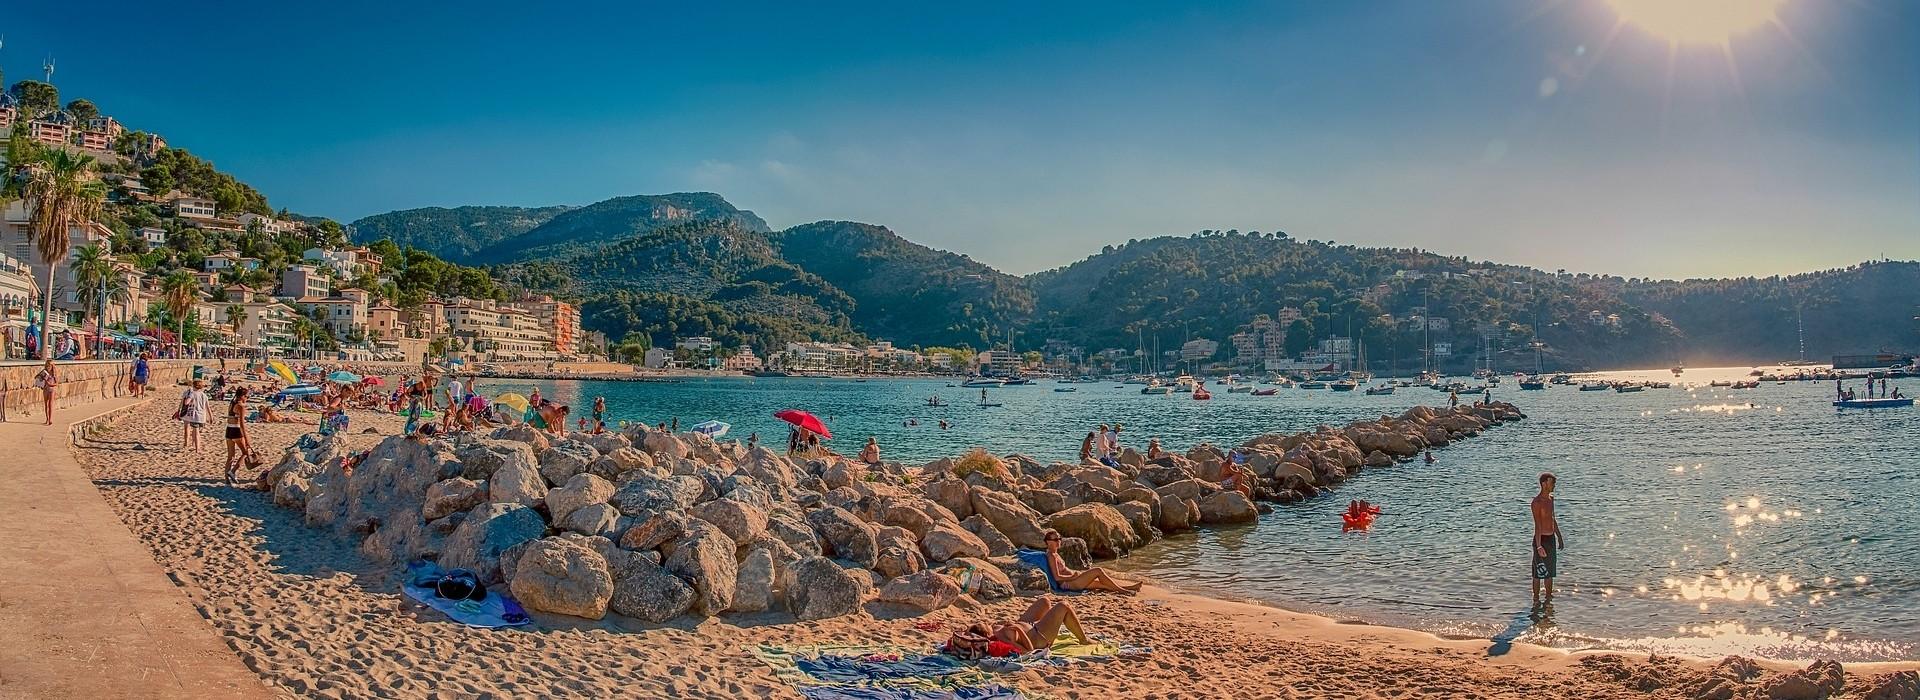 Summer holidays in Mallorca